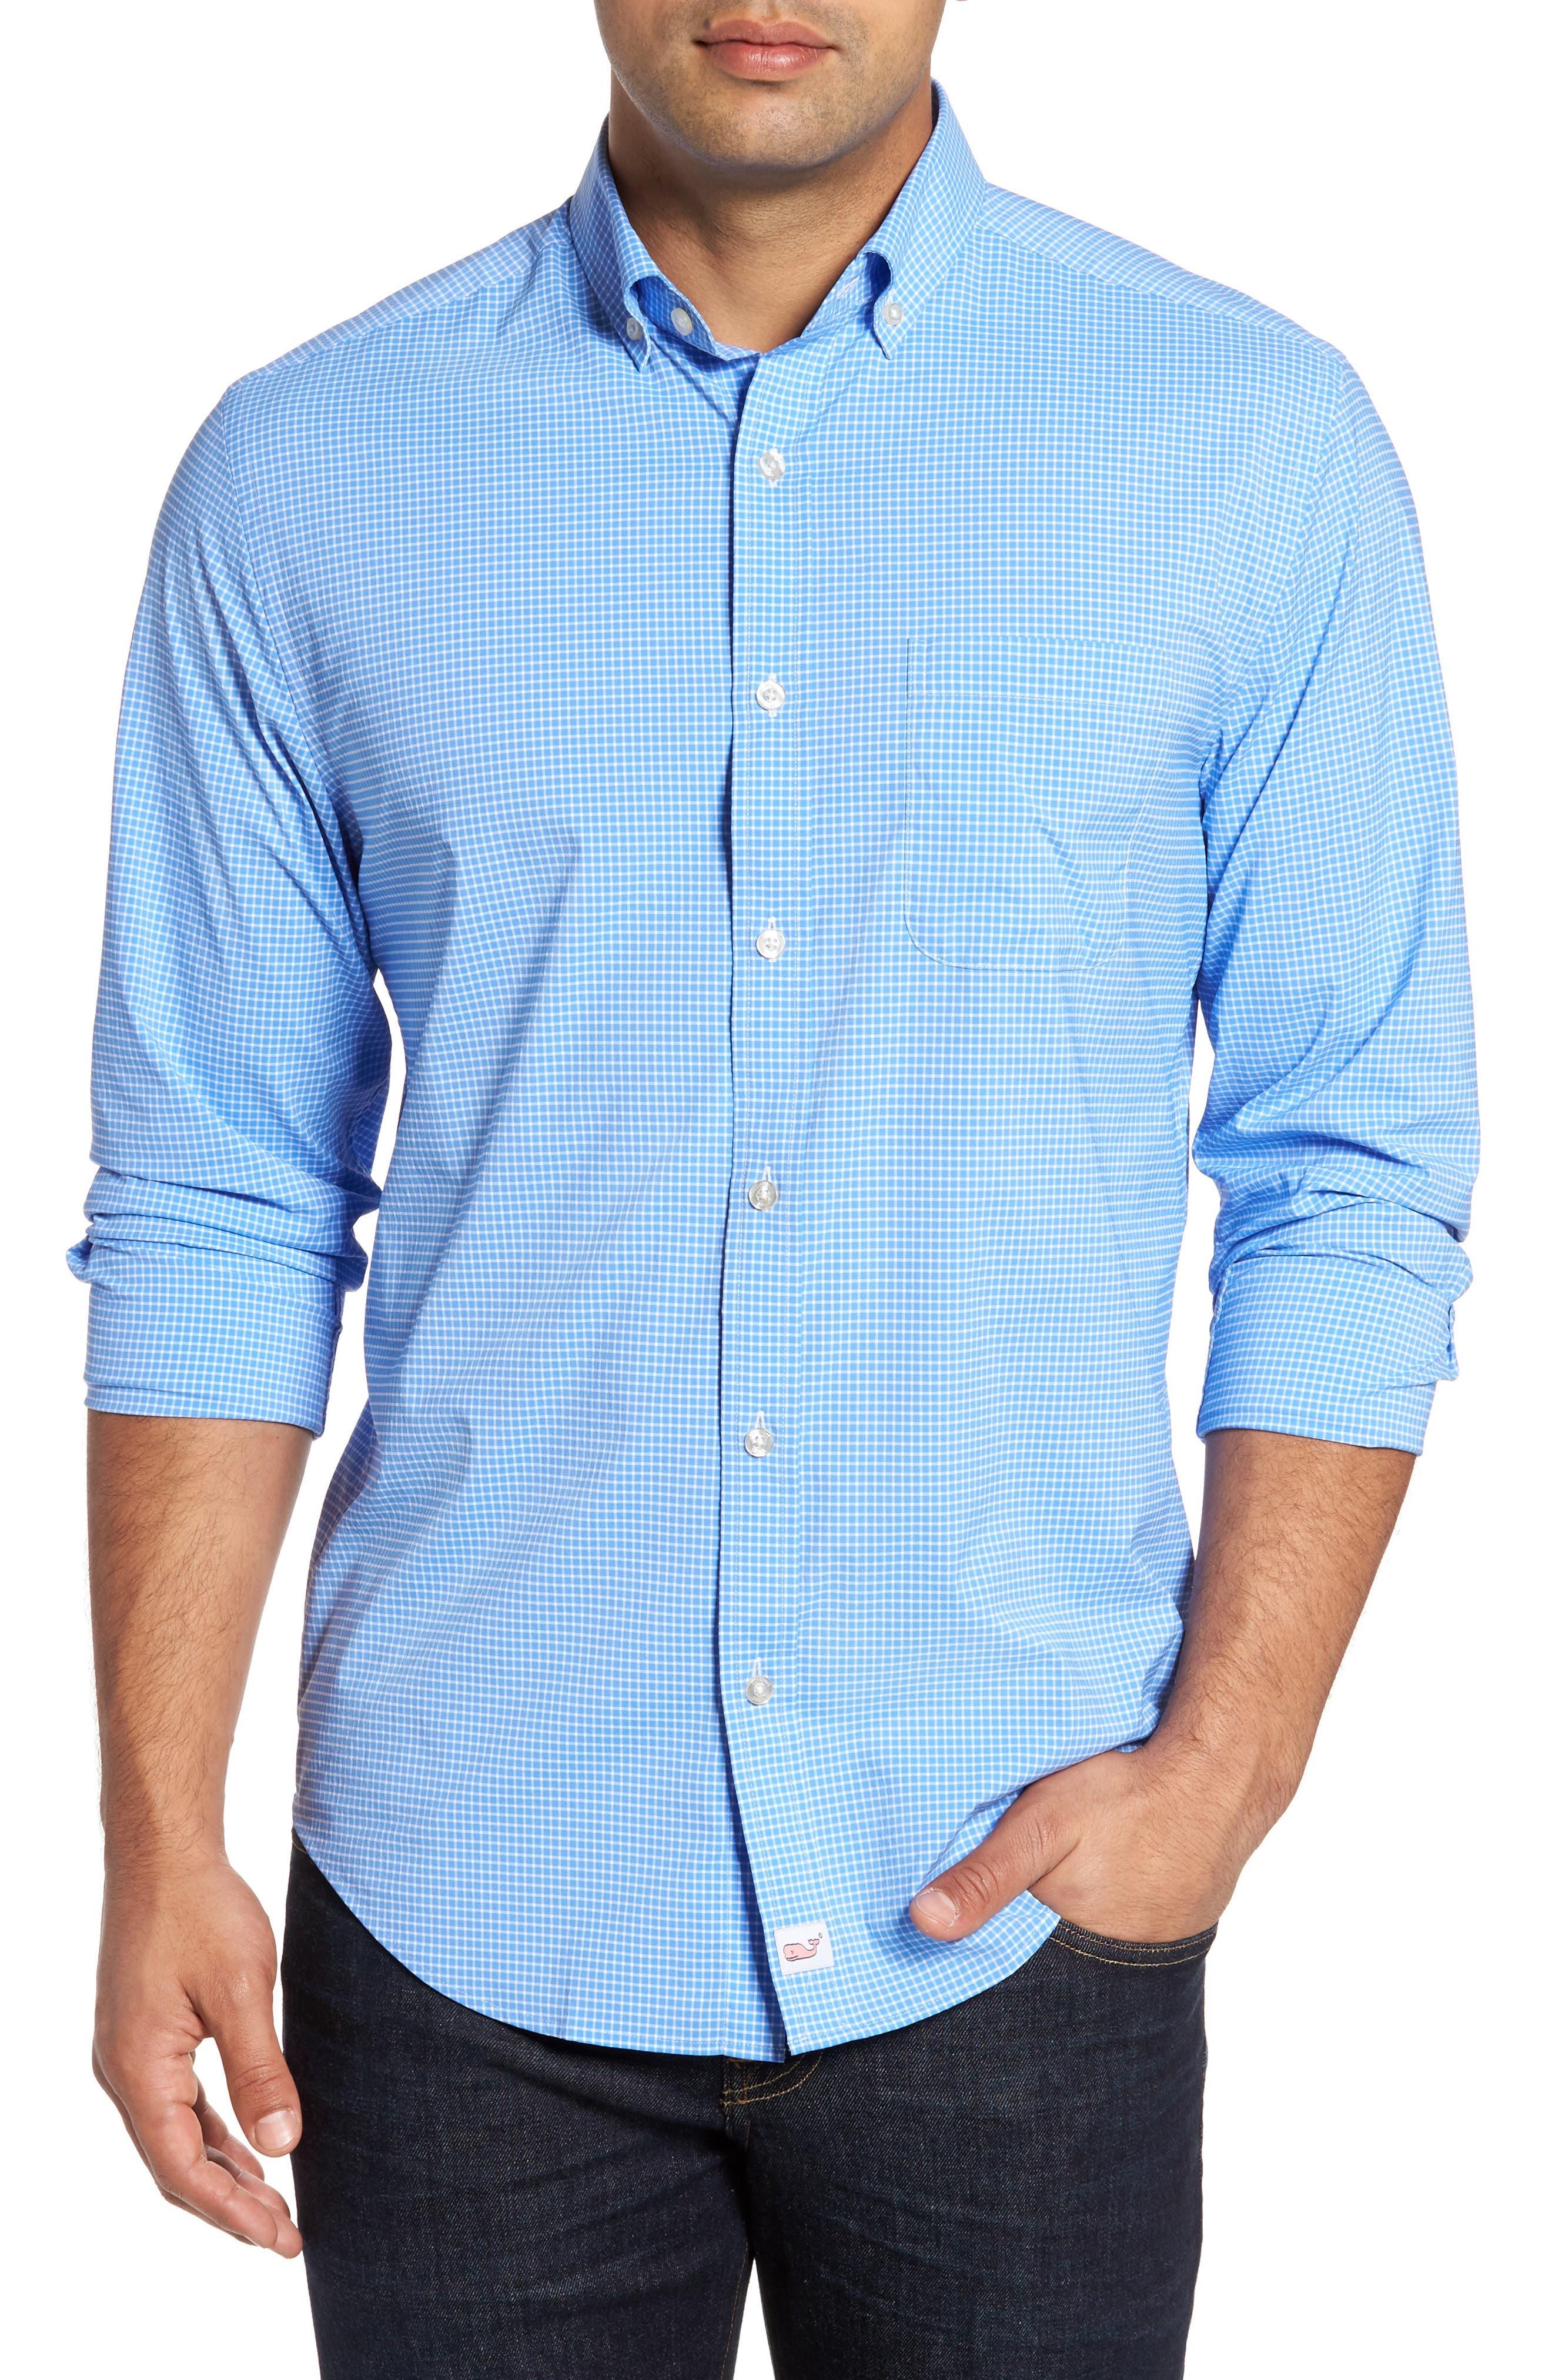 Main Image - vineyard vines Anchor Row Classic Fit Check Sport Shirt